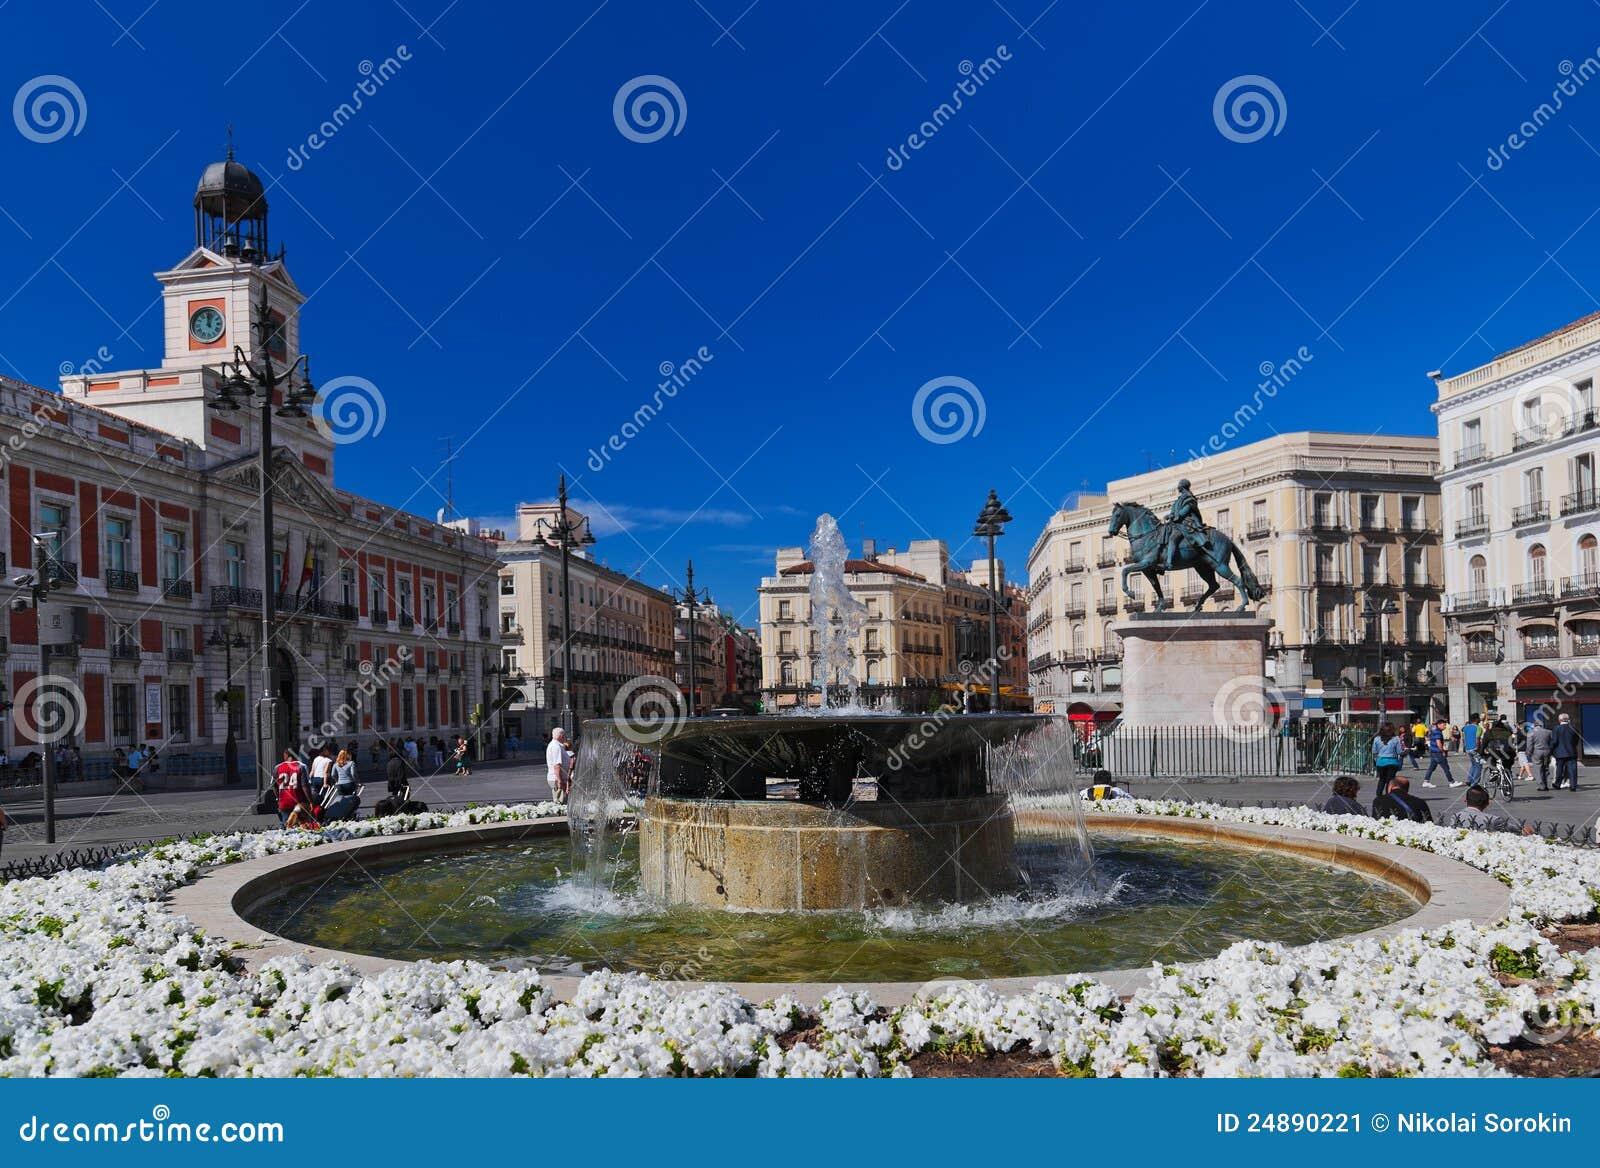 Sol plaza in madrid spain stock image image 24890221 for Sol plaza madrid